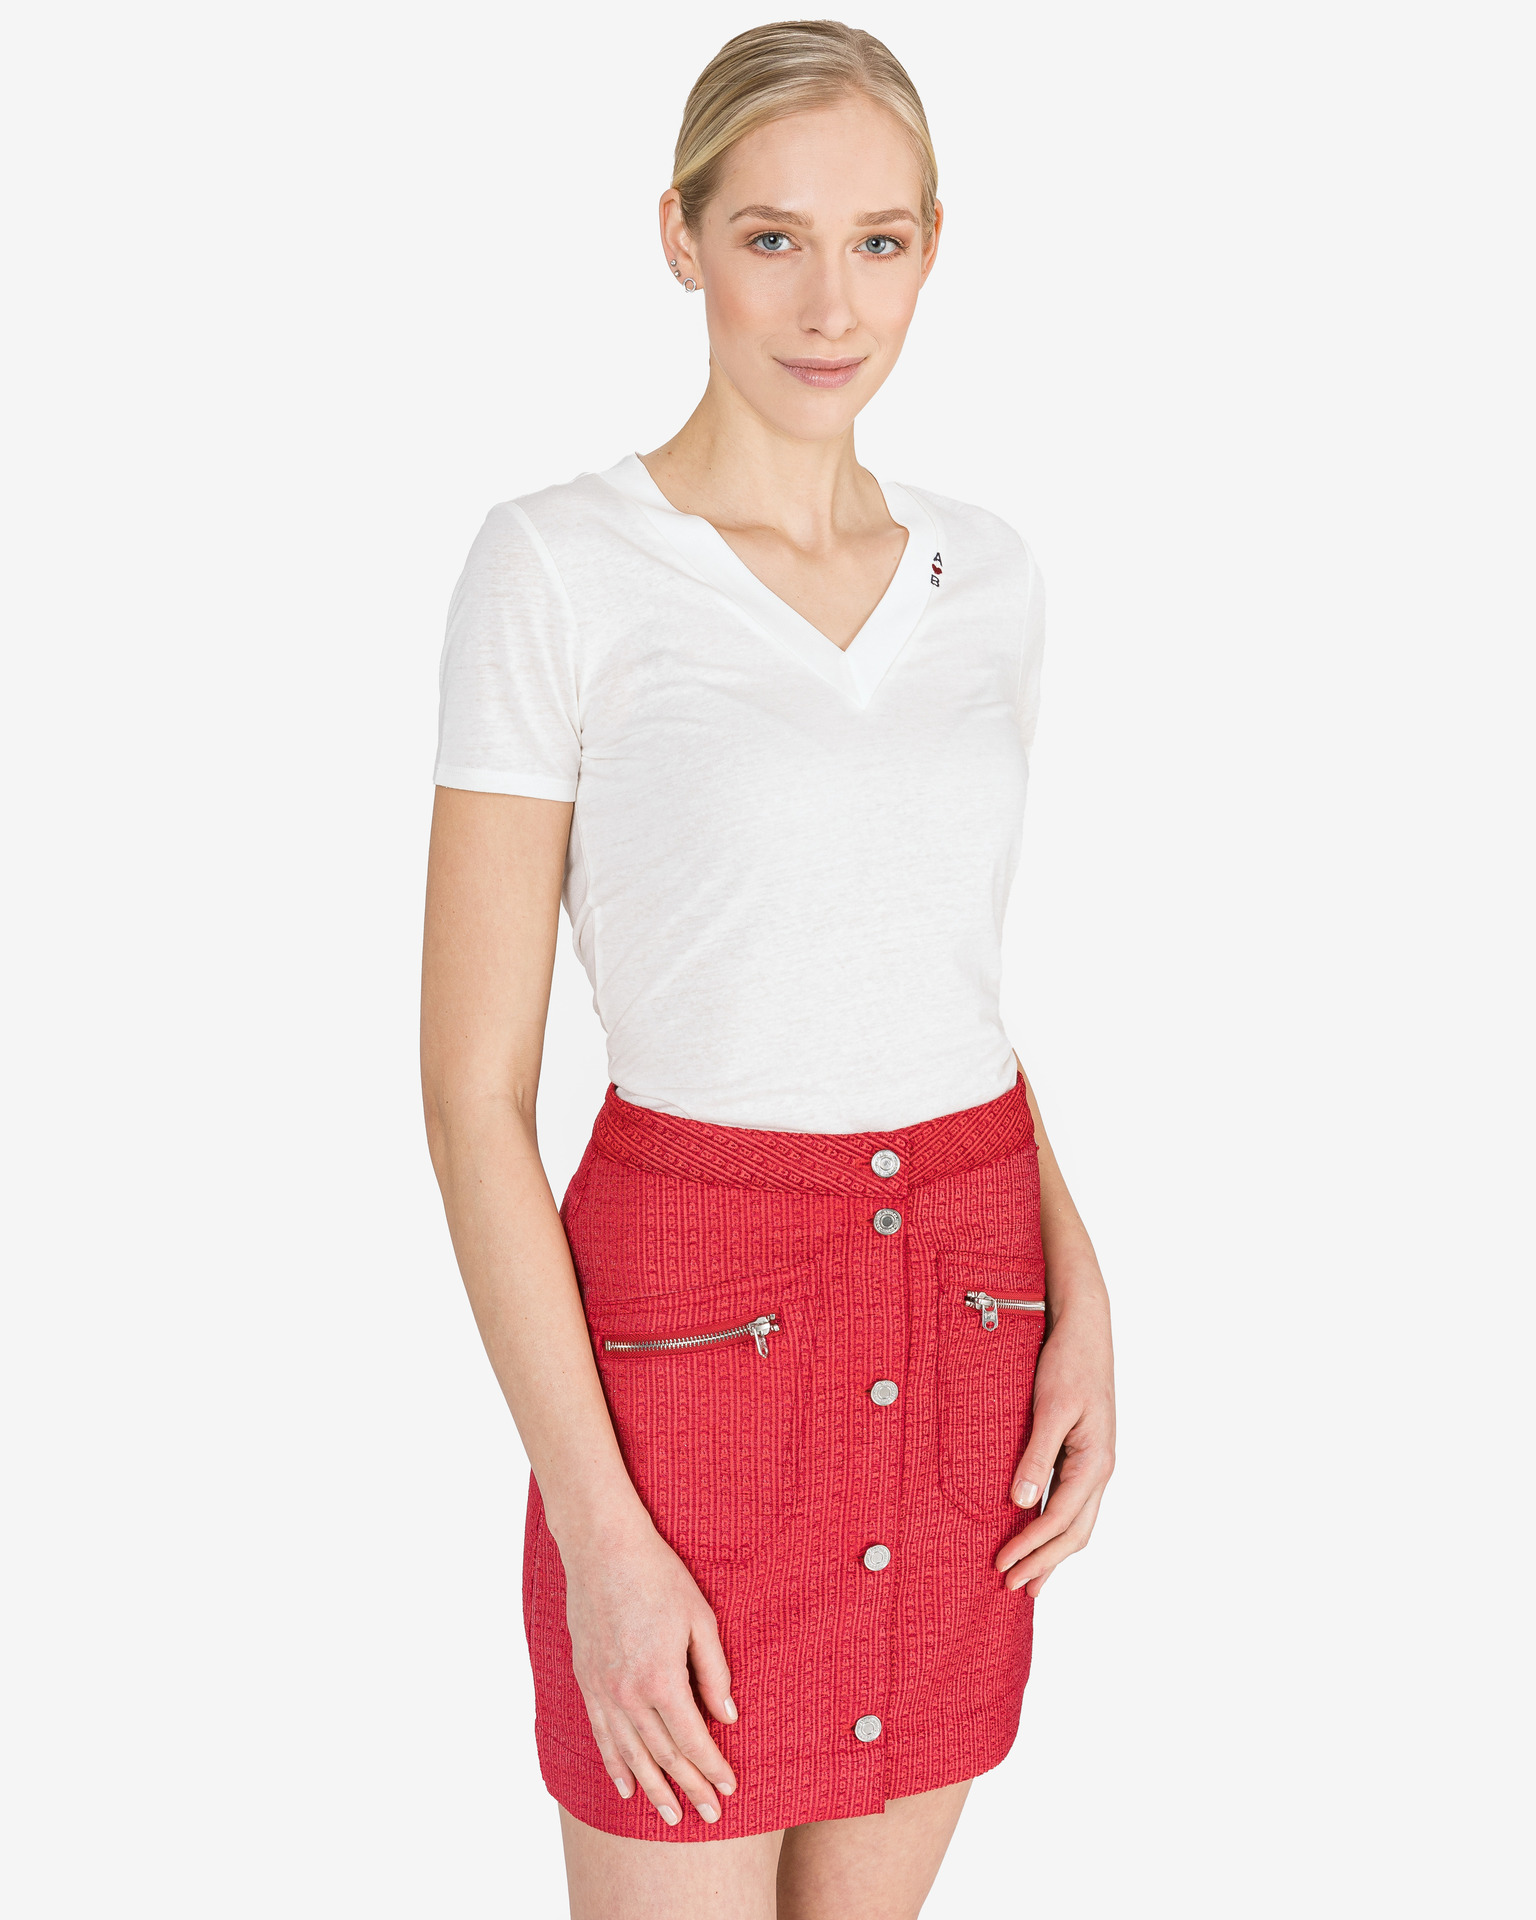 Scotch & Soda Maglietta donna bianco